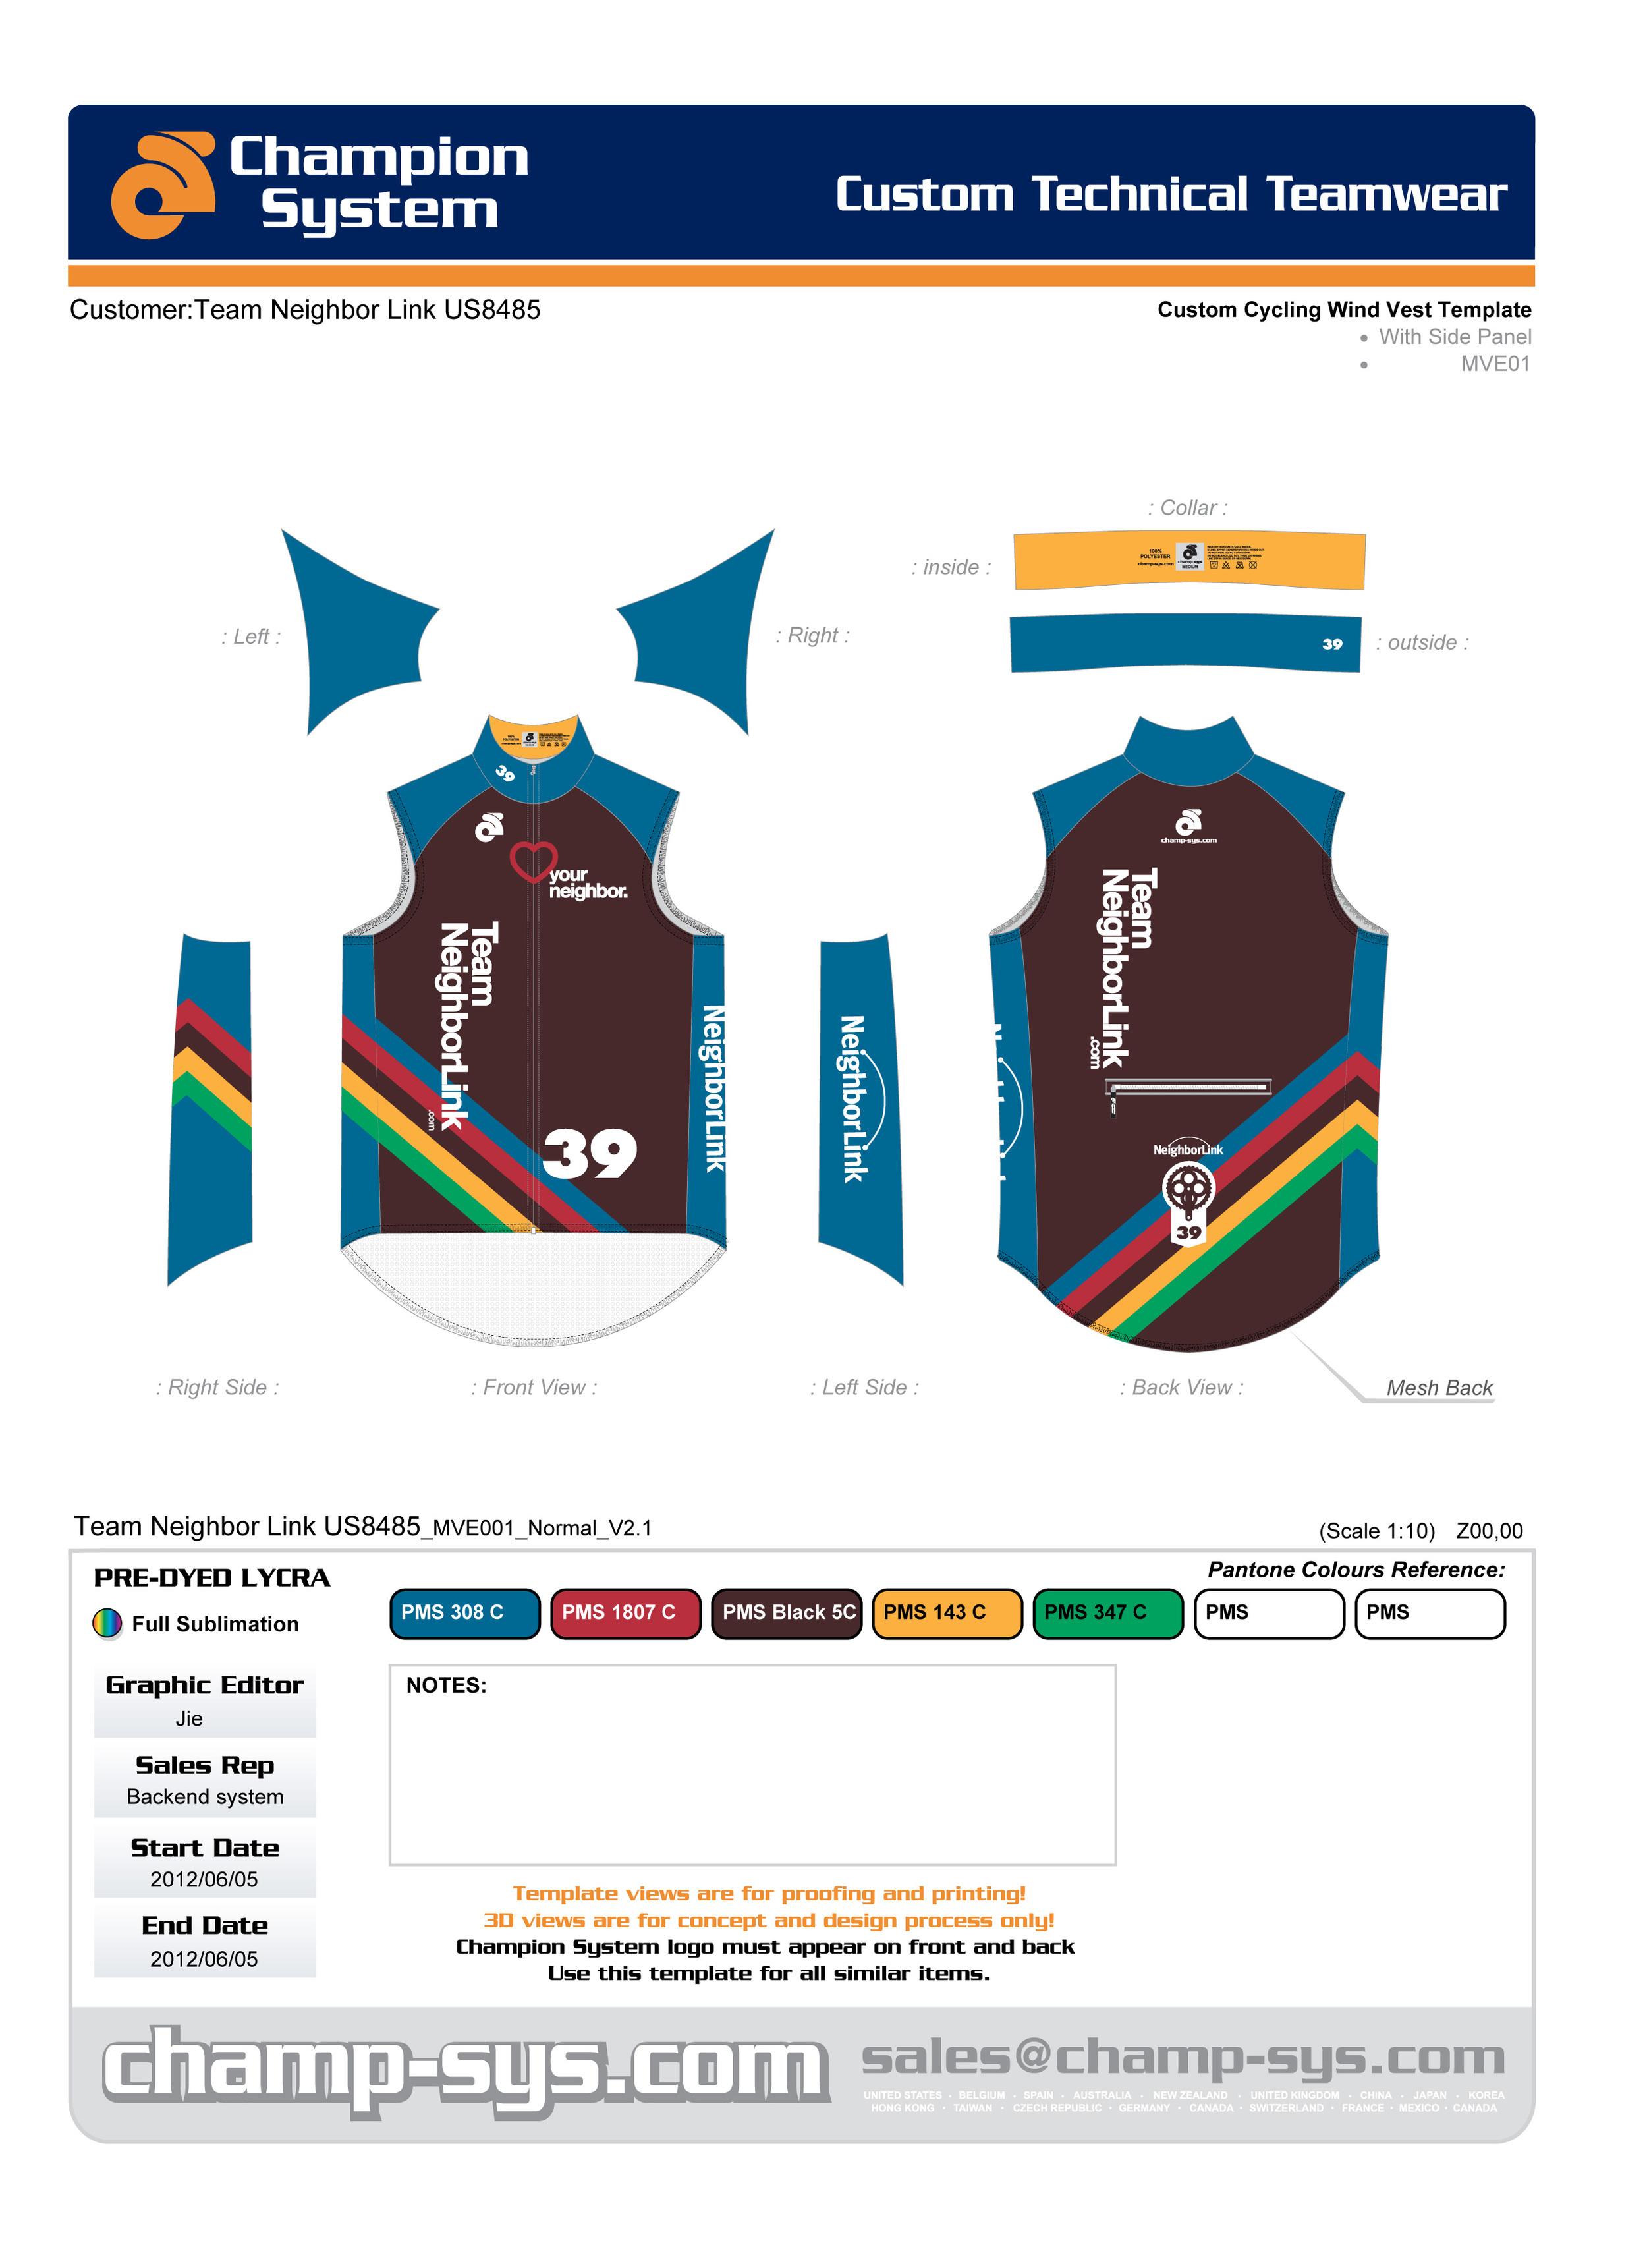 Cycling Wind Vest Design